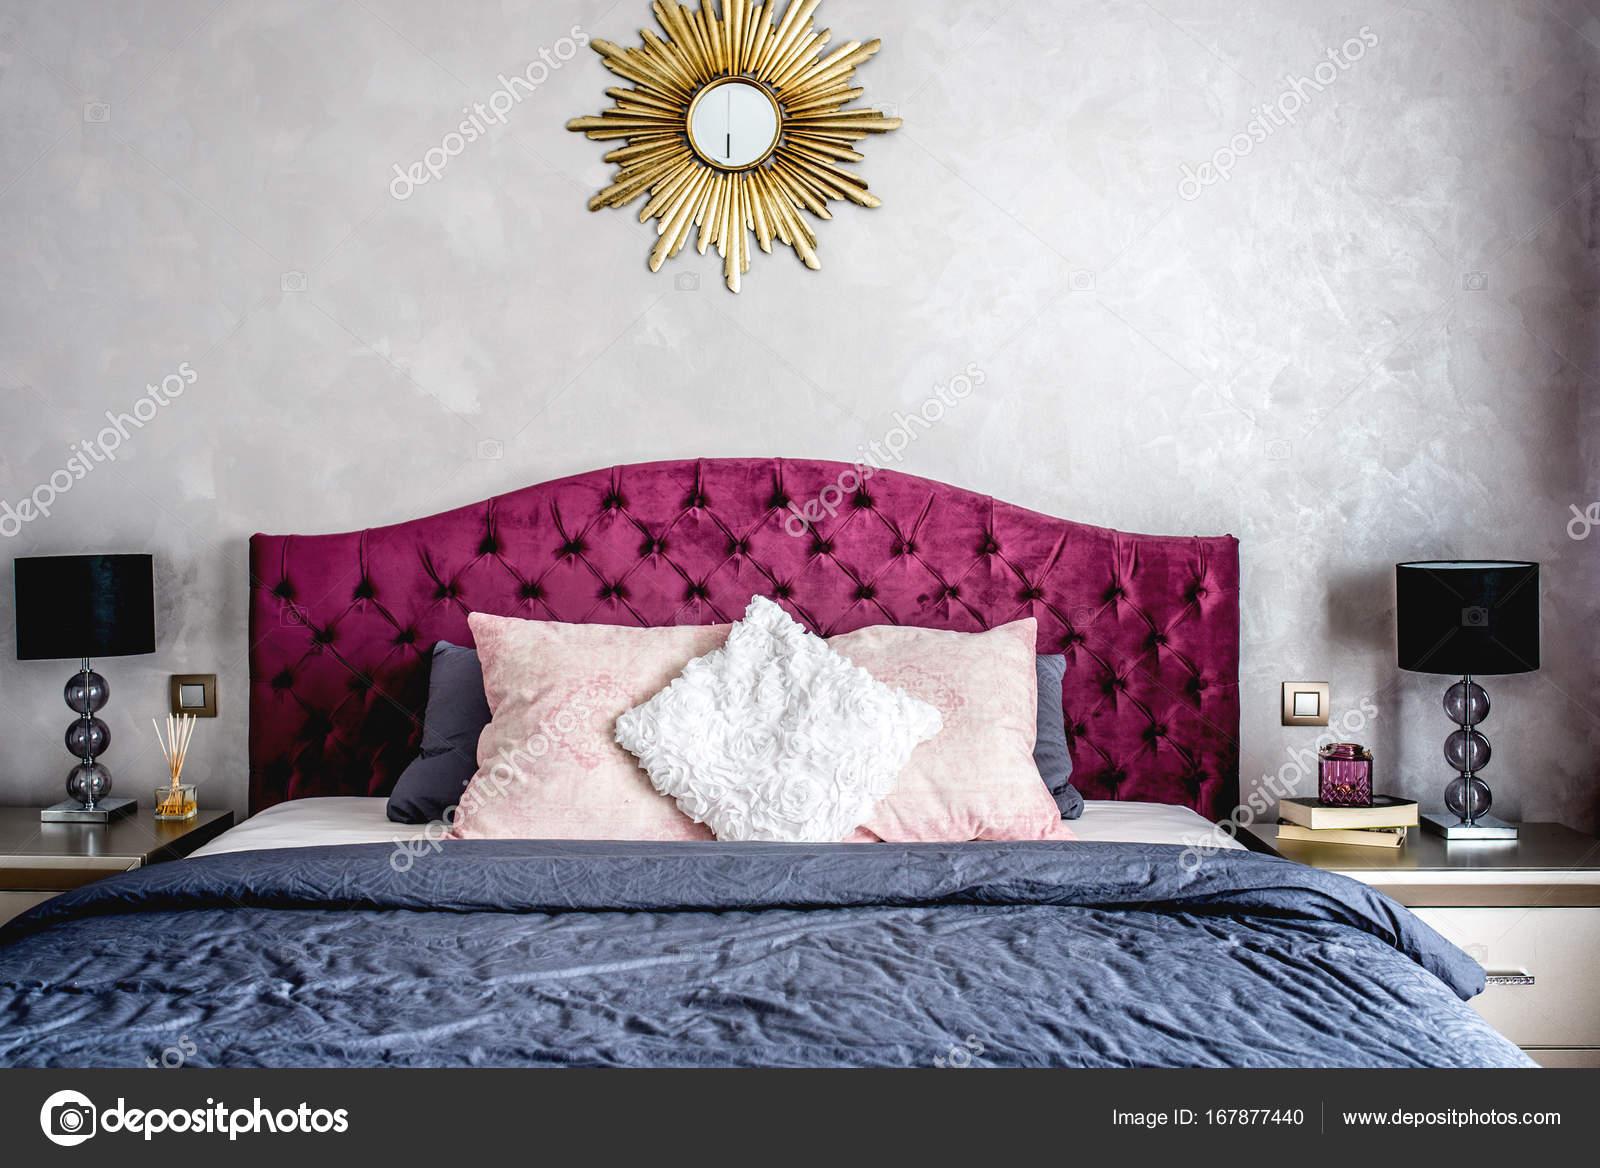 Design Slaapkamer Meubilair : Luxe slaapkamer interieur met grijze bedden en modern meubilair